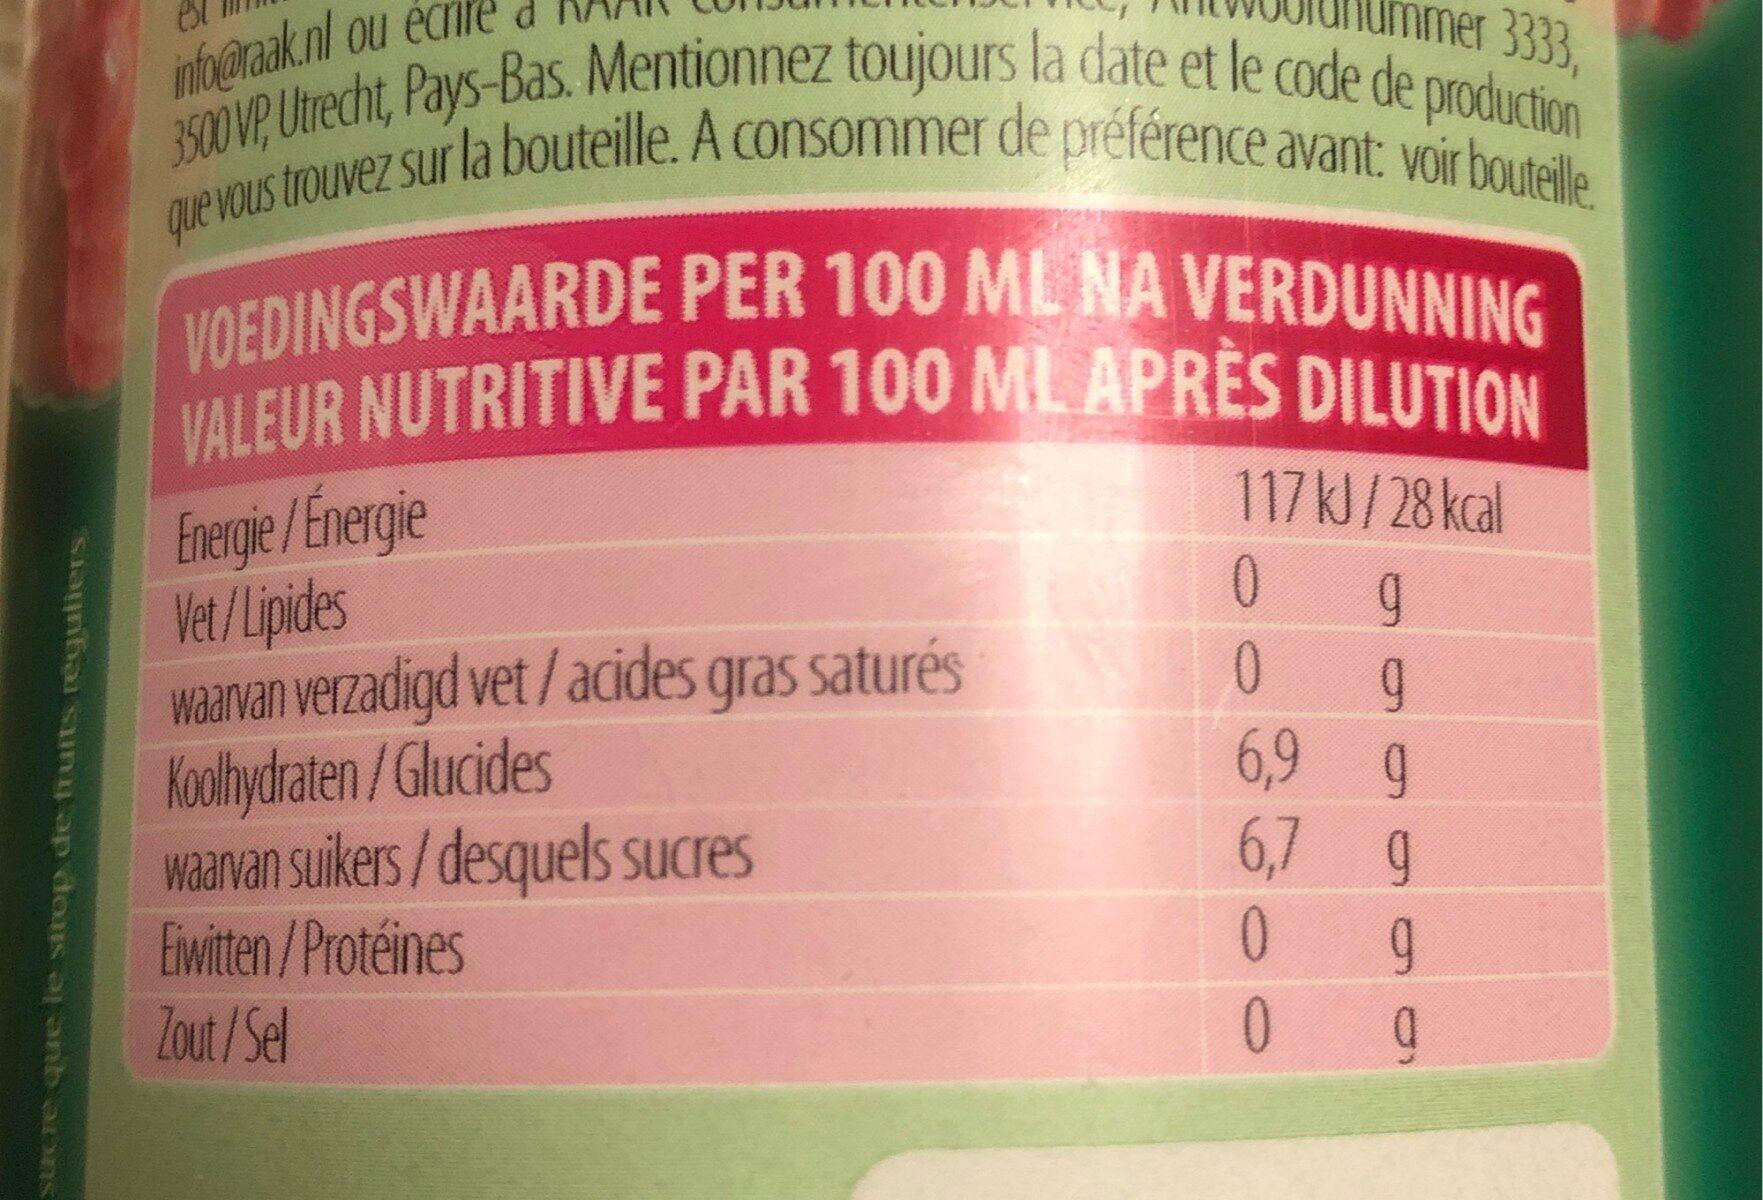 sirop de fruit framboise - Informations nutritionnelles - fr